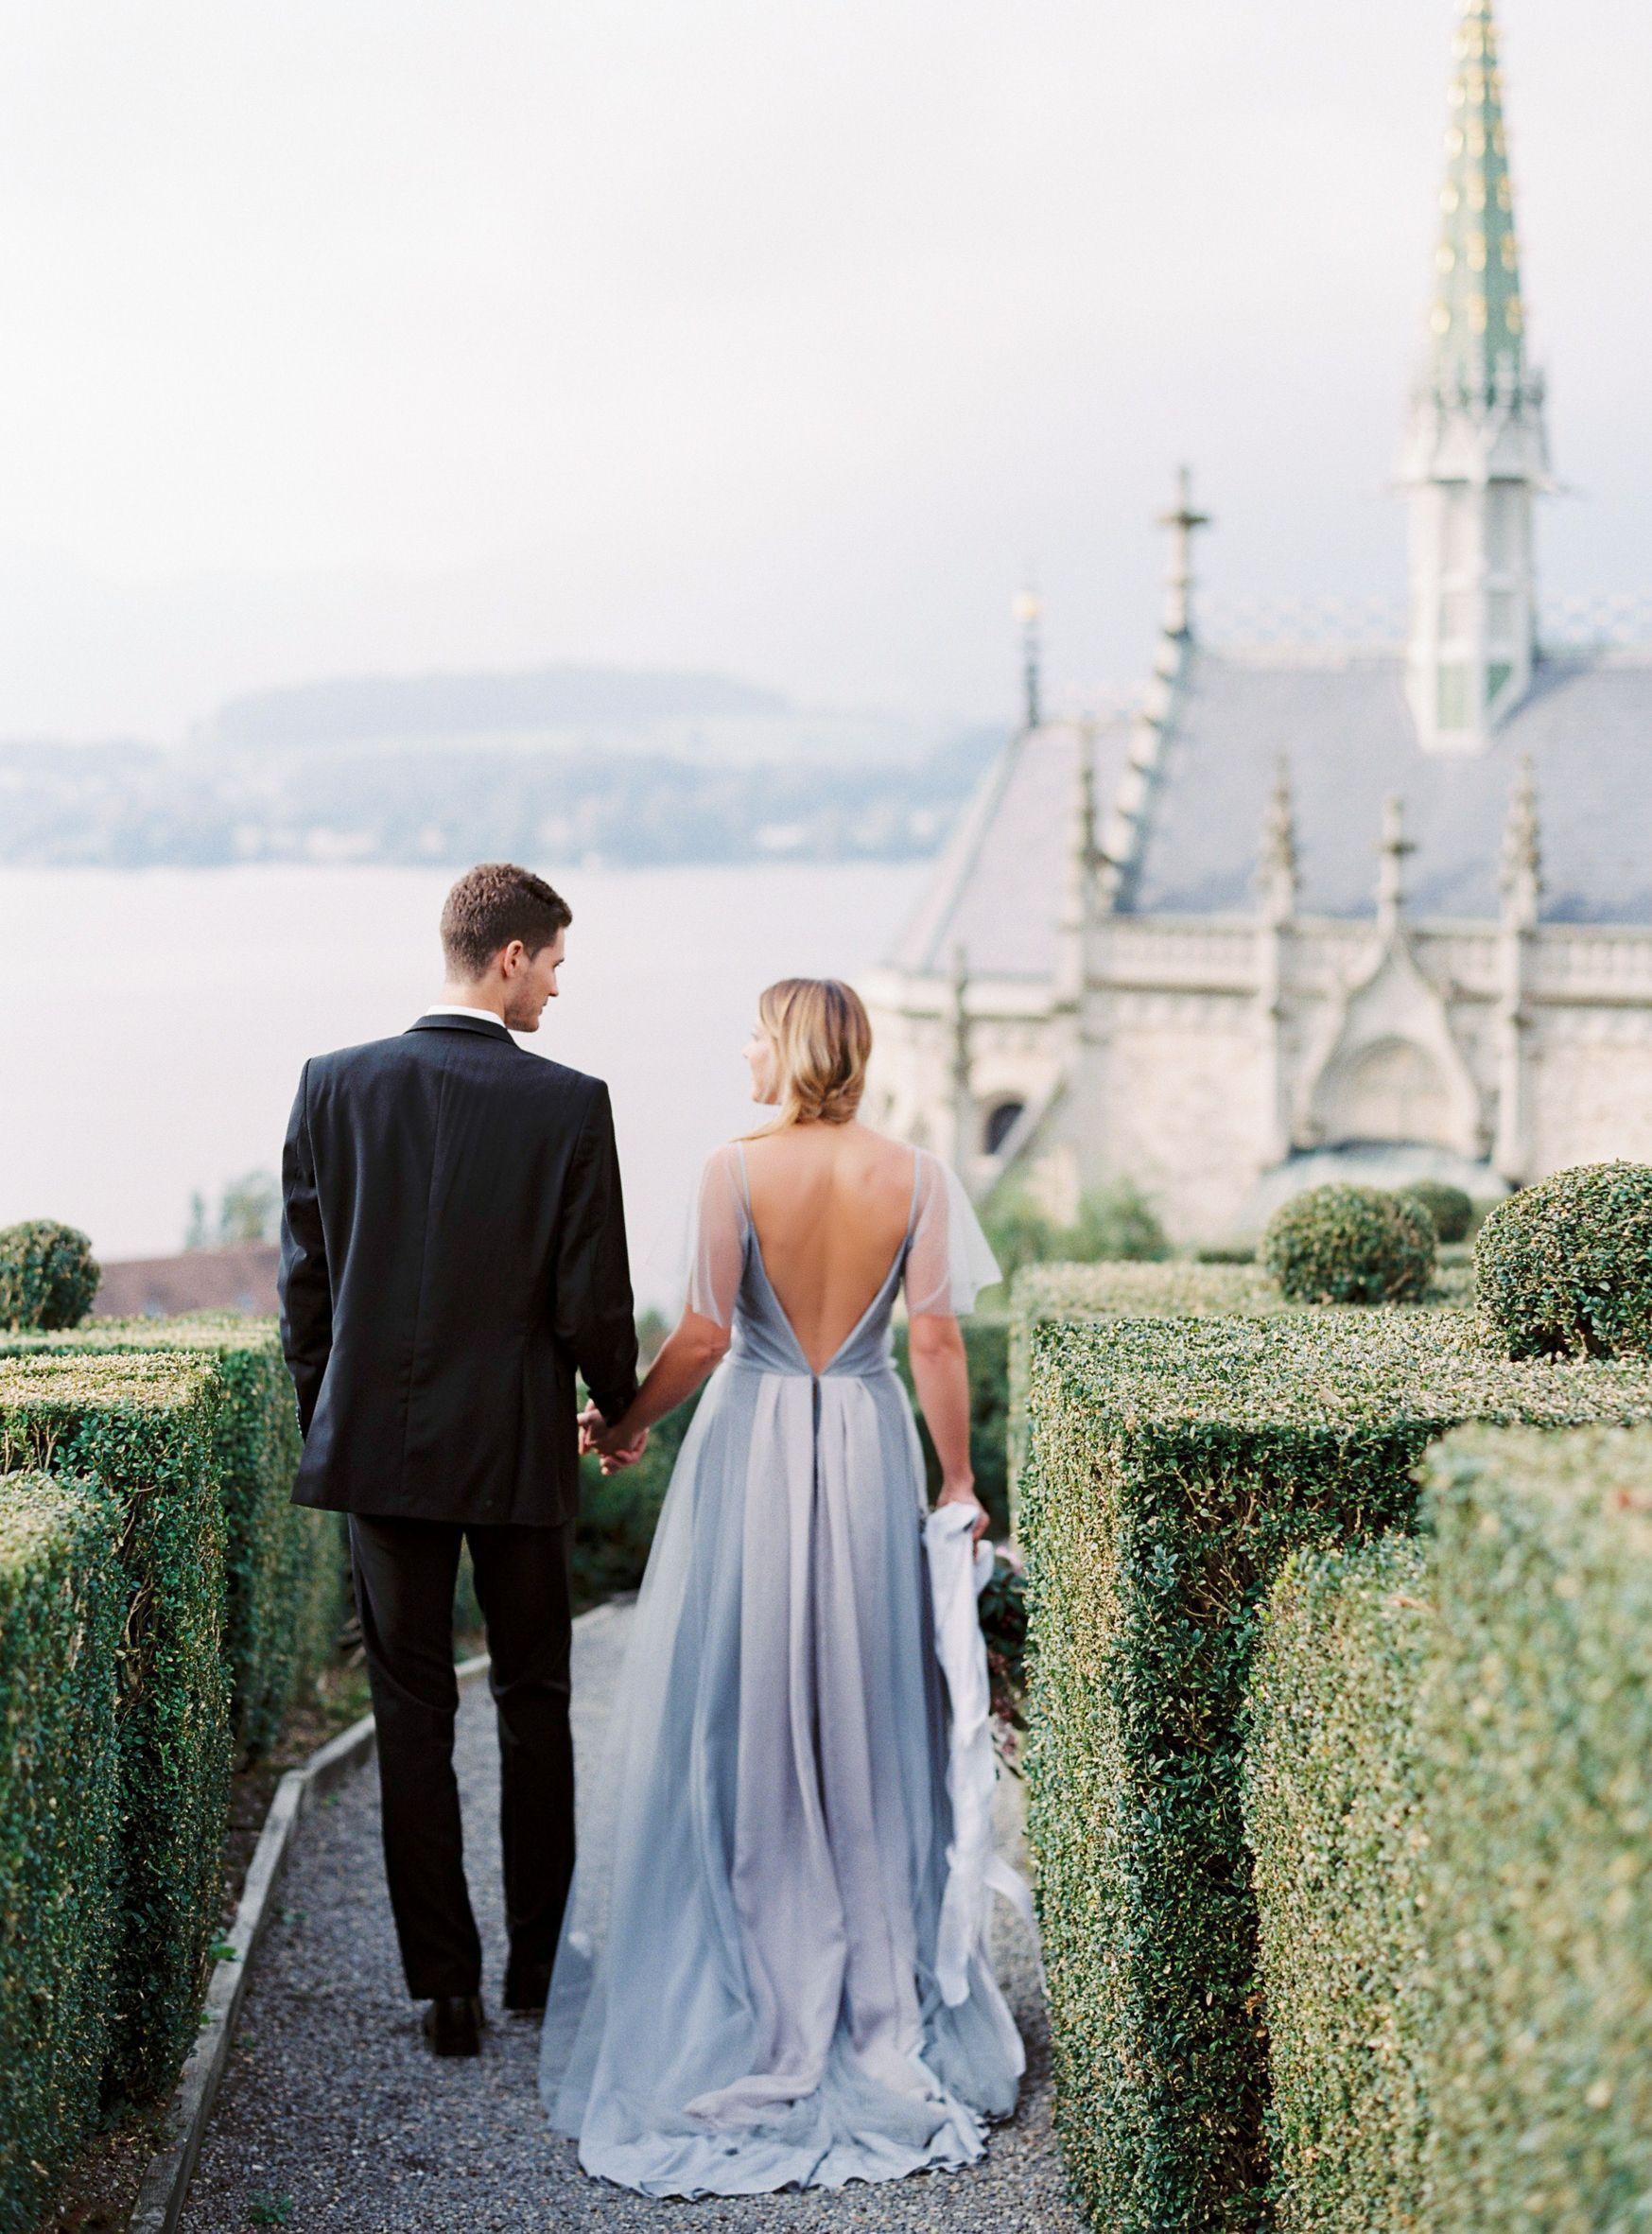 Family And Wedding Photographer In Zurich, Luzern, Zug   Elena Widmer  Photography